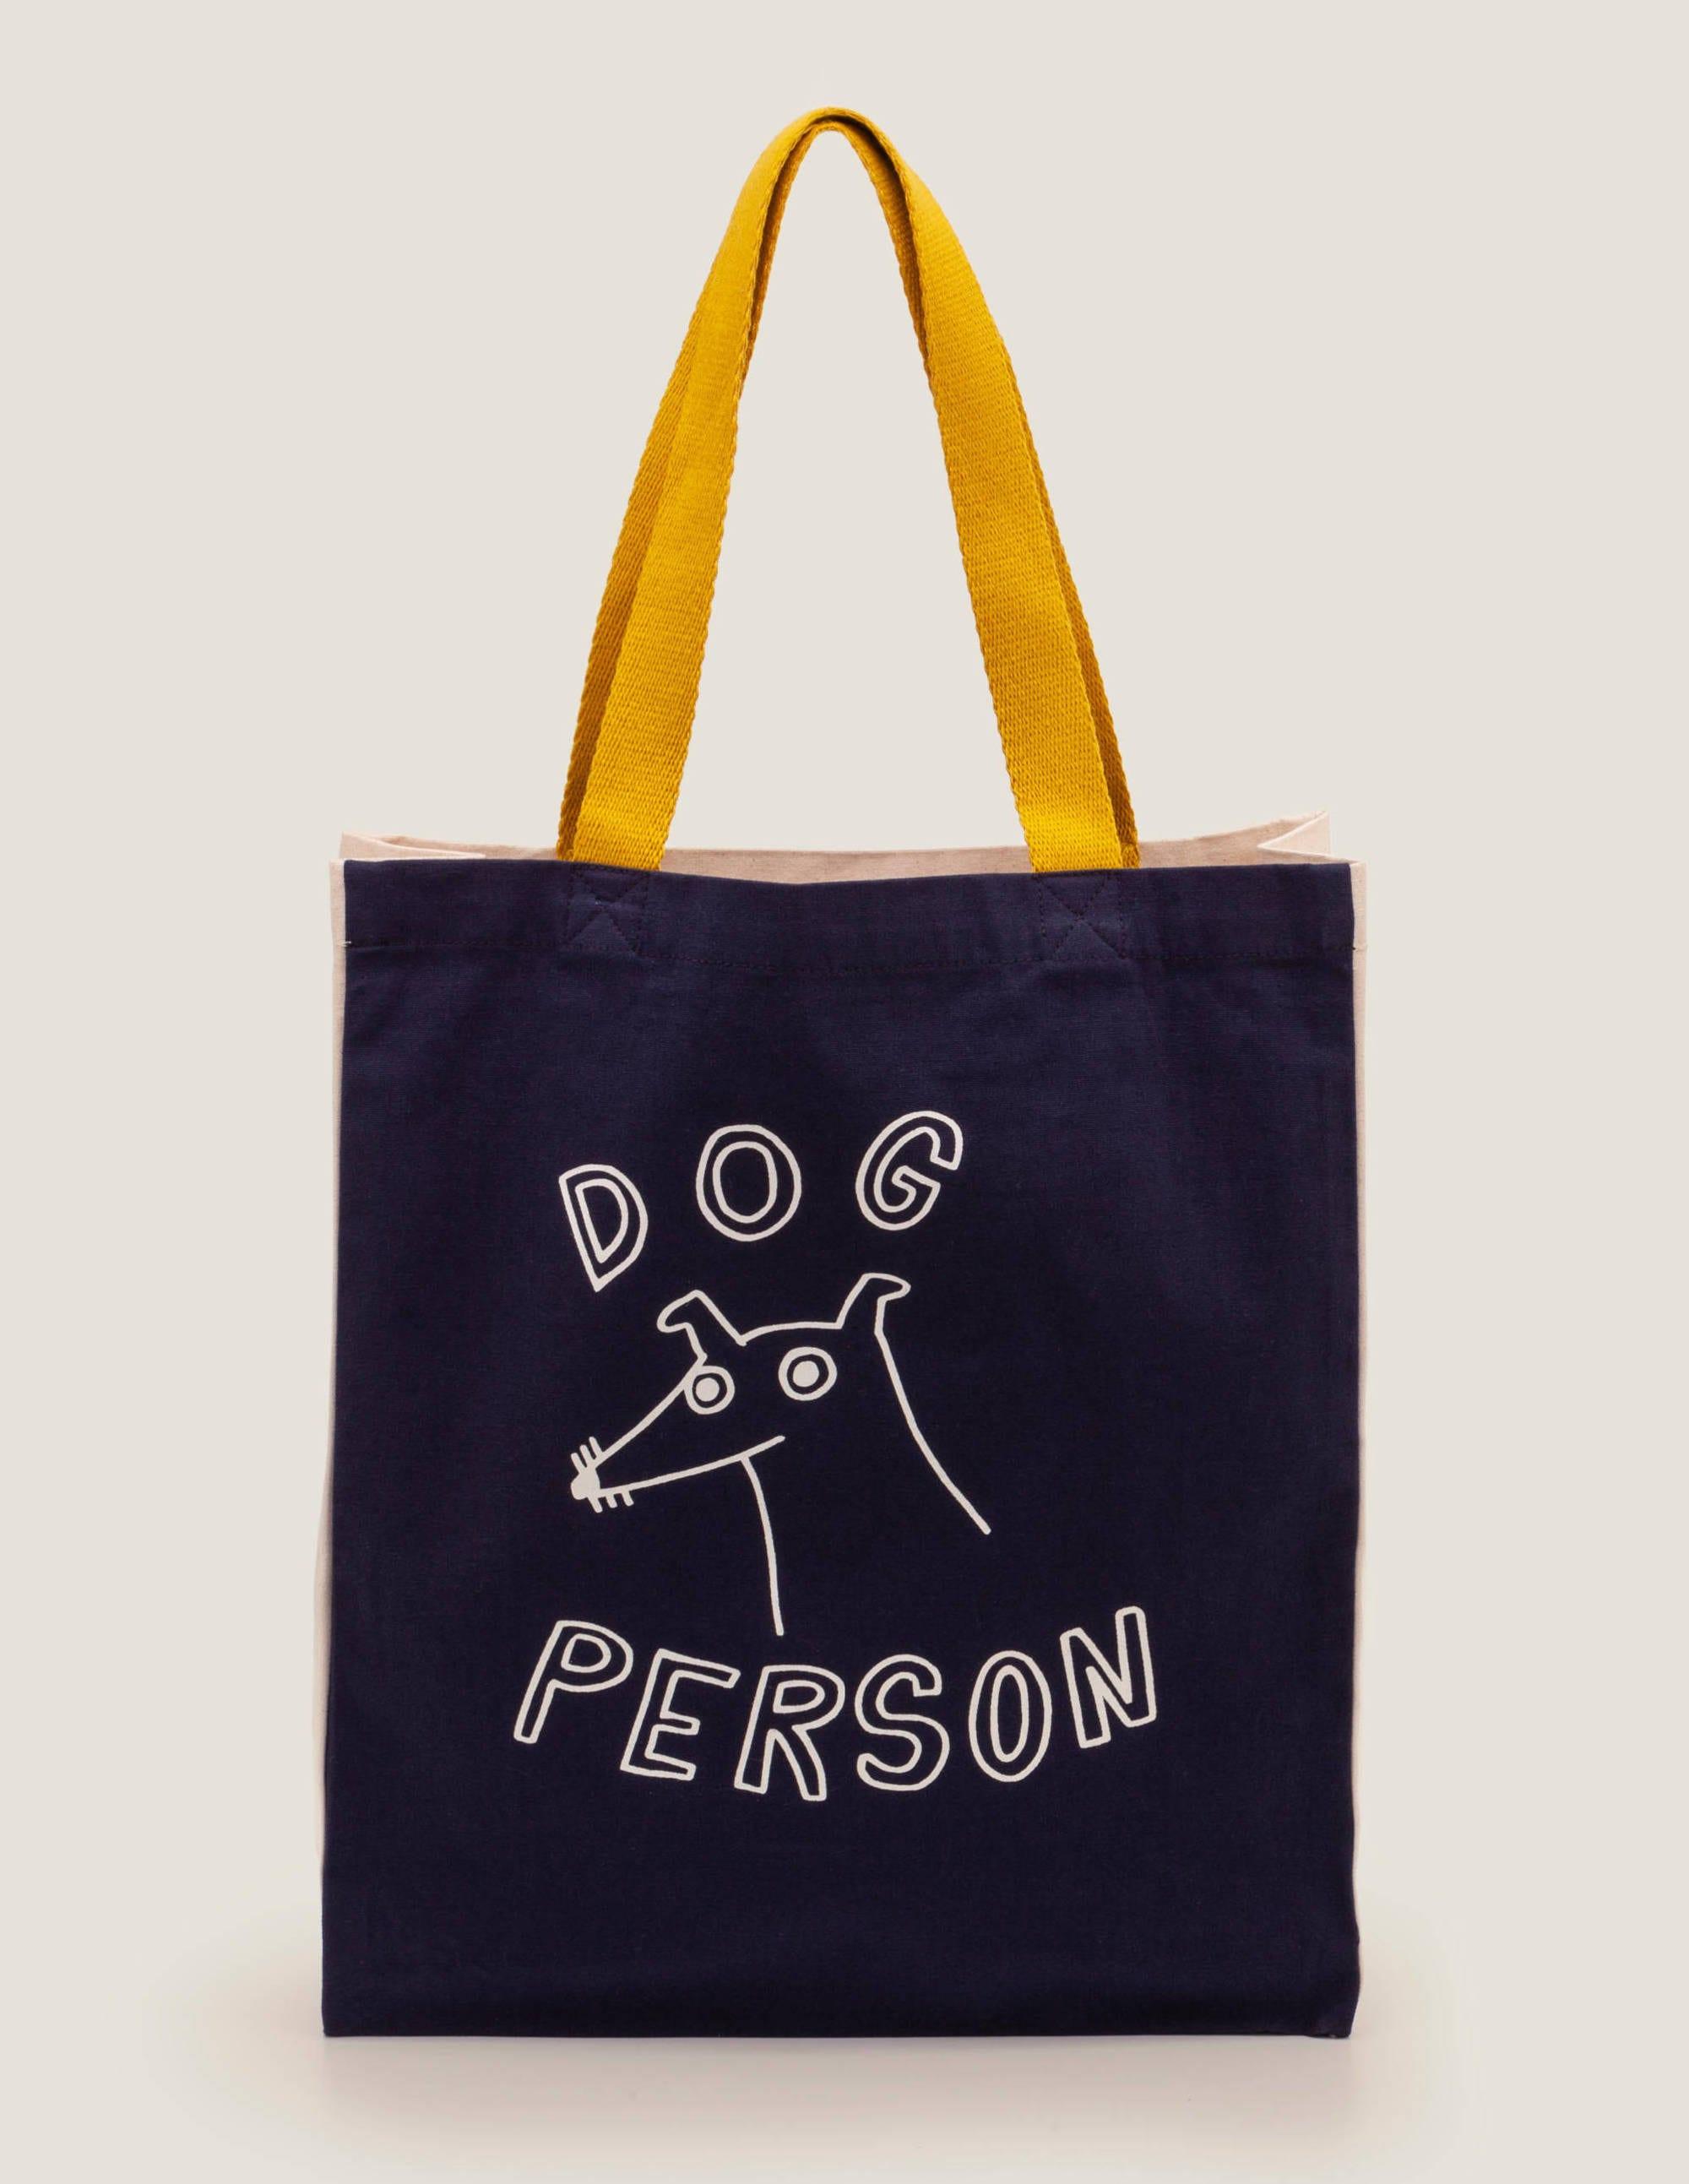 Naughty Girl Canvas Tote Shopping Bag Cotton Printed Shopper Bag Xmas Gift